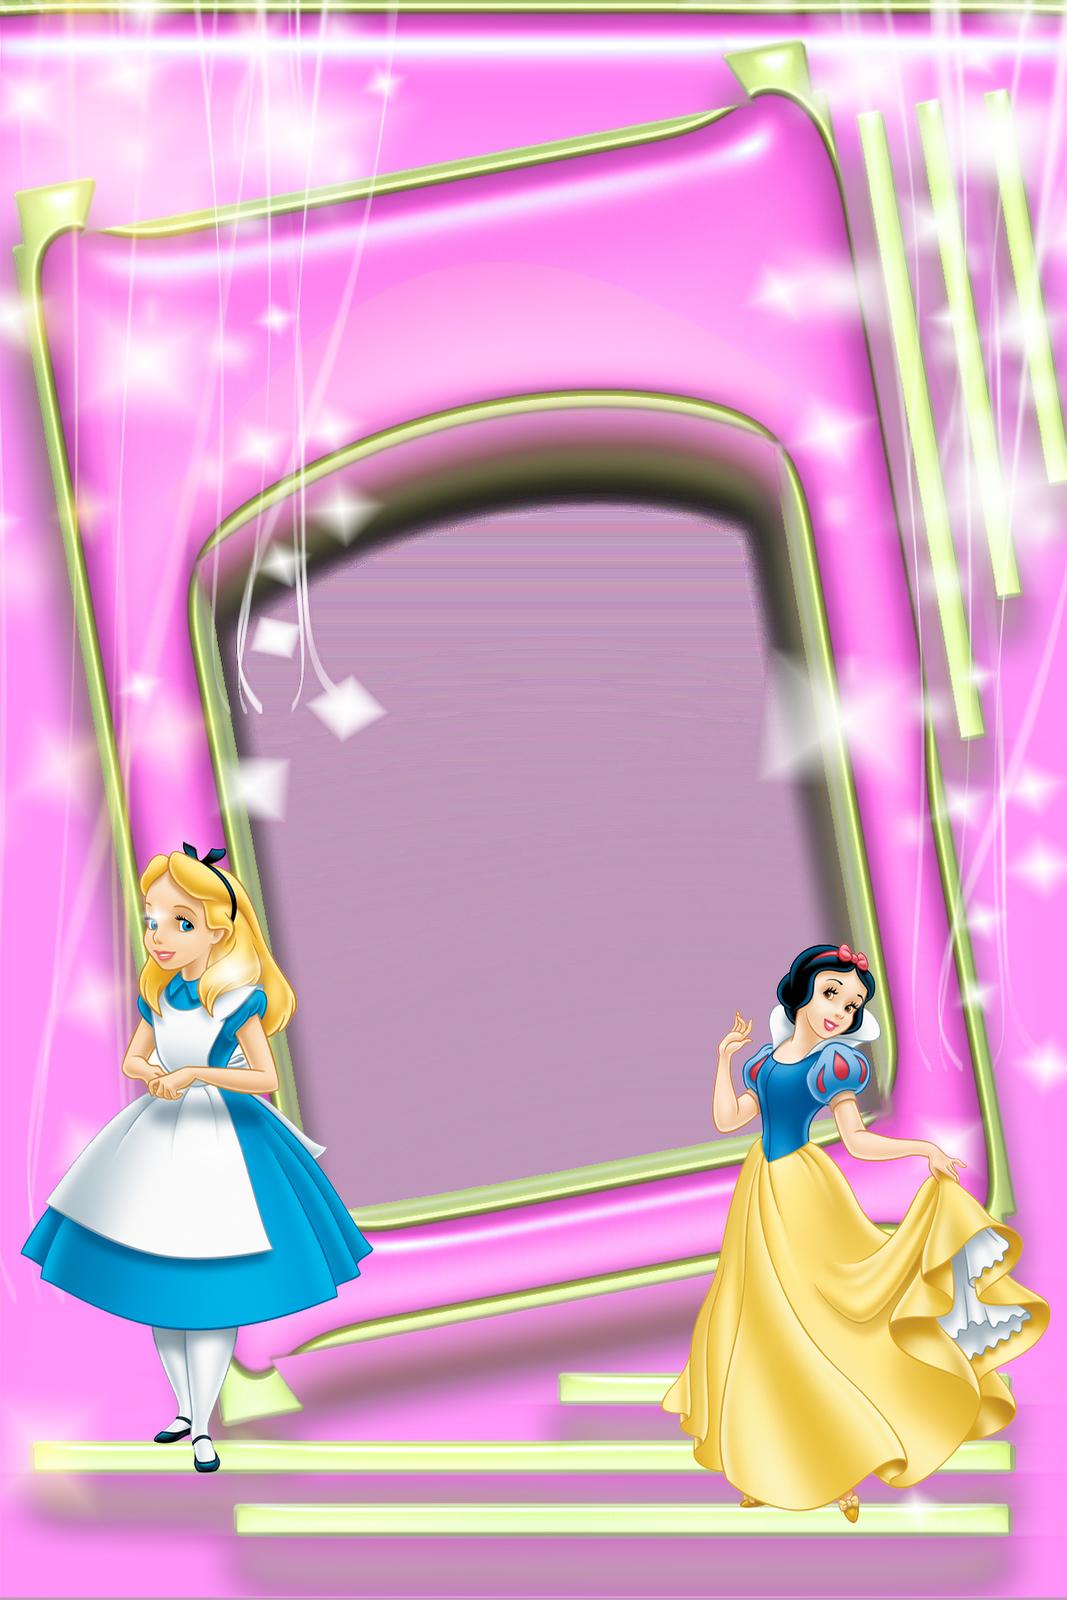 Imagens para photoshop: Princesas disney frames PNG | קליפ ארט ...